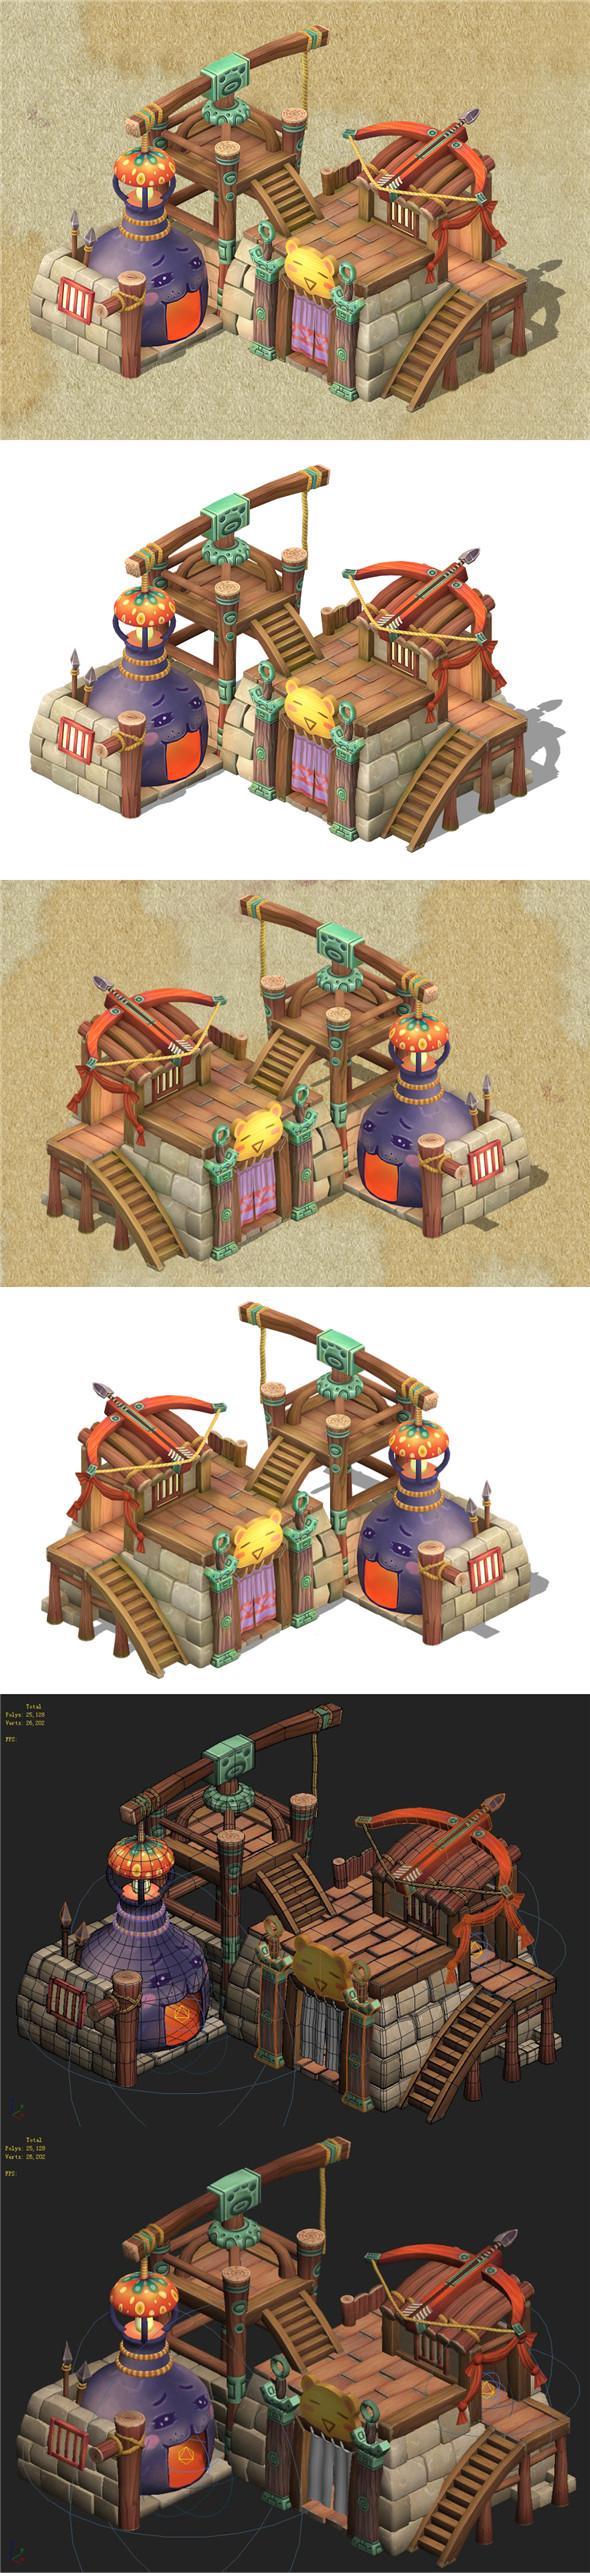 Cartoon Edition - Arms Shop 03 - 3DOcean Item for Sale